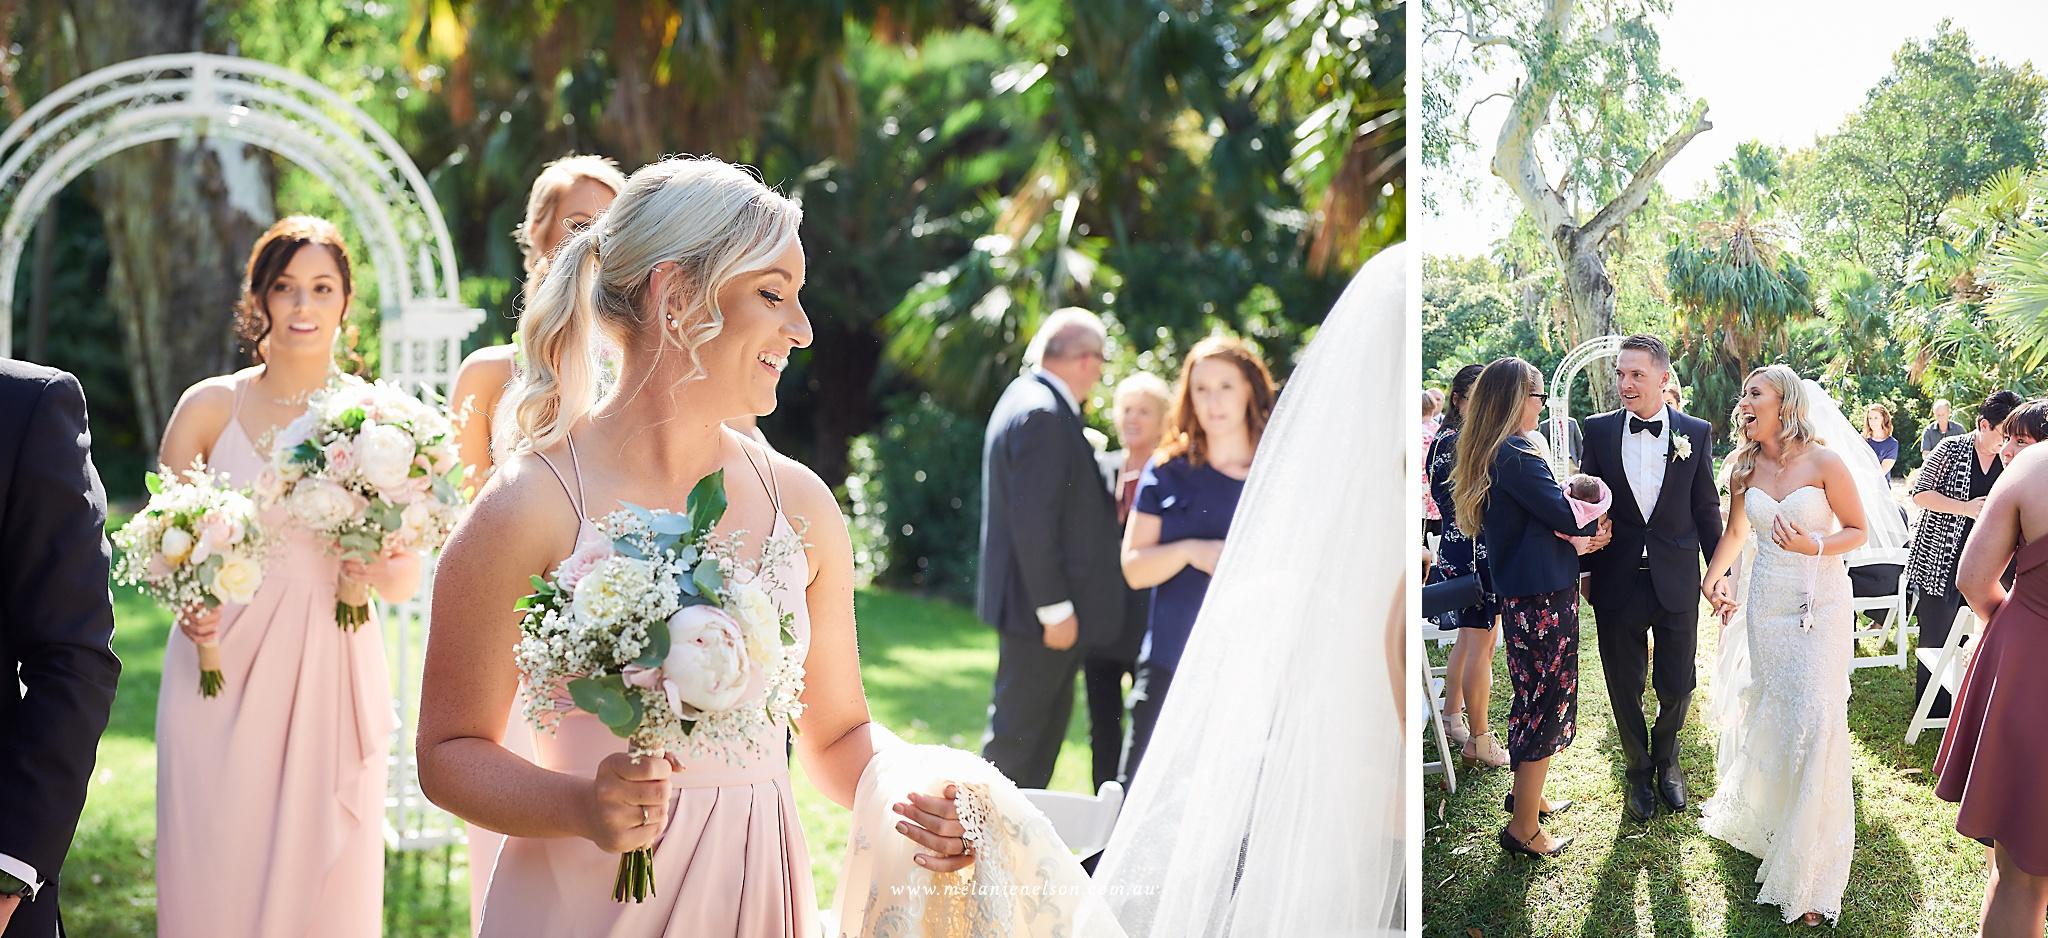 adelaide_botanic_gardens_wedding_0030.jpg